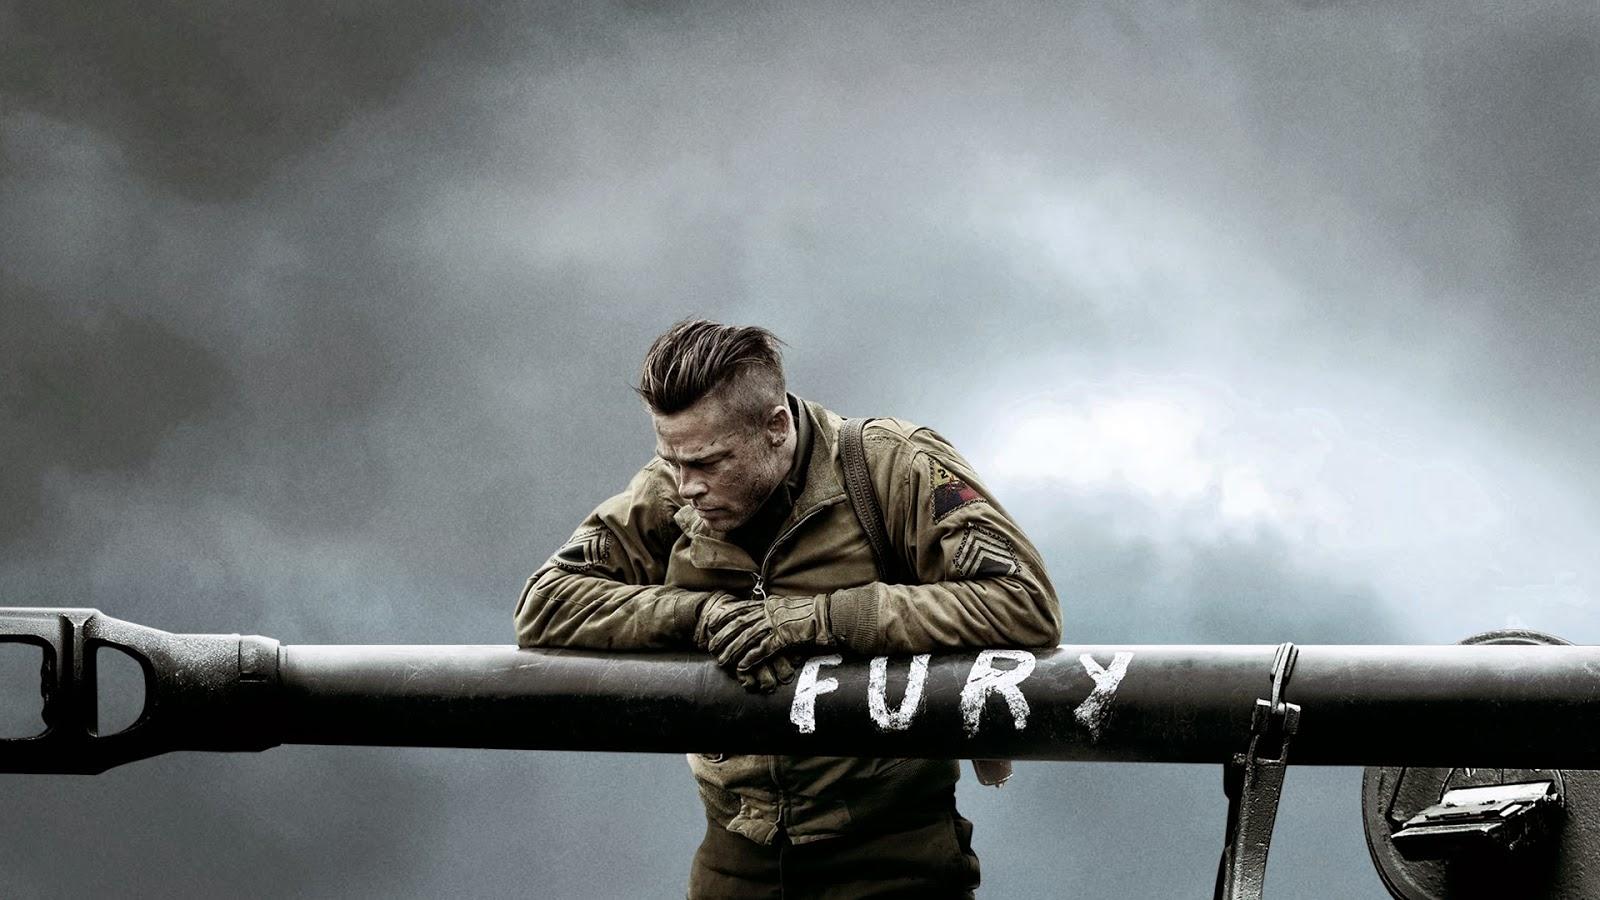 Fury Movie HD Wallpaper Beautiful and Deep HD Wallpapers Mad Max fury 1600x900